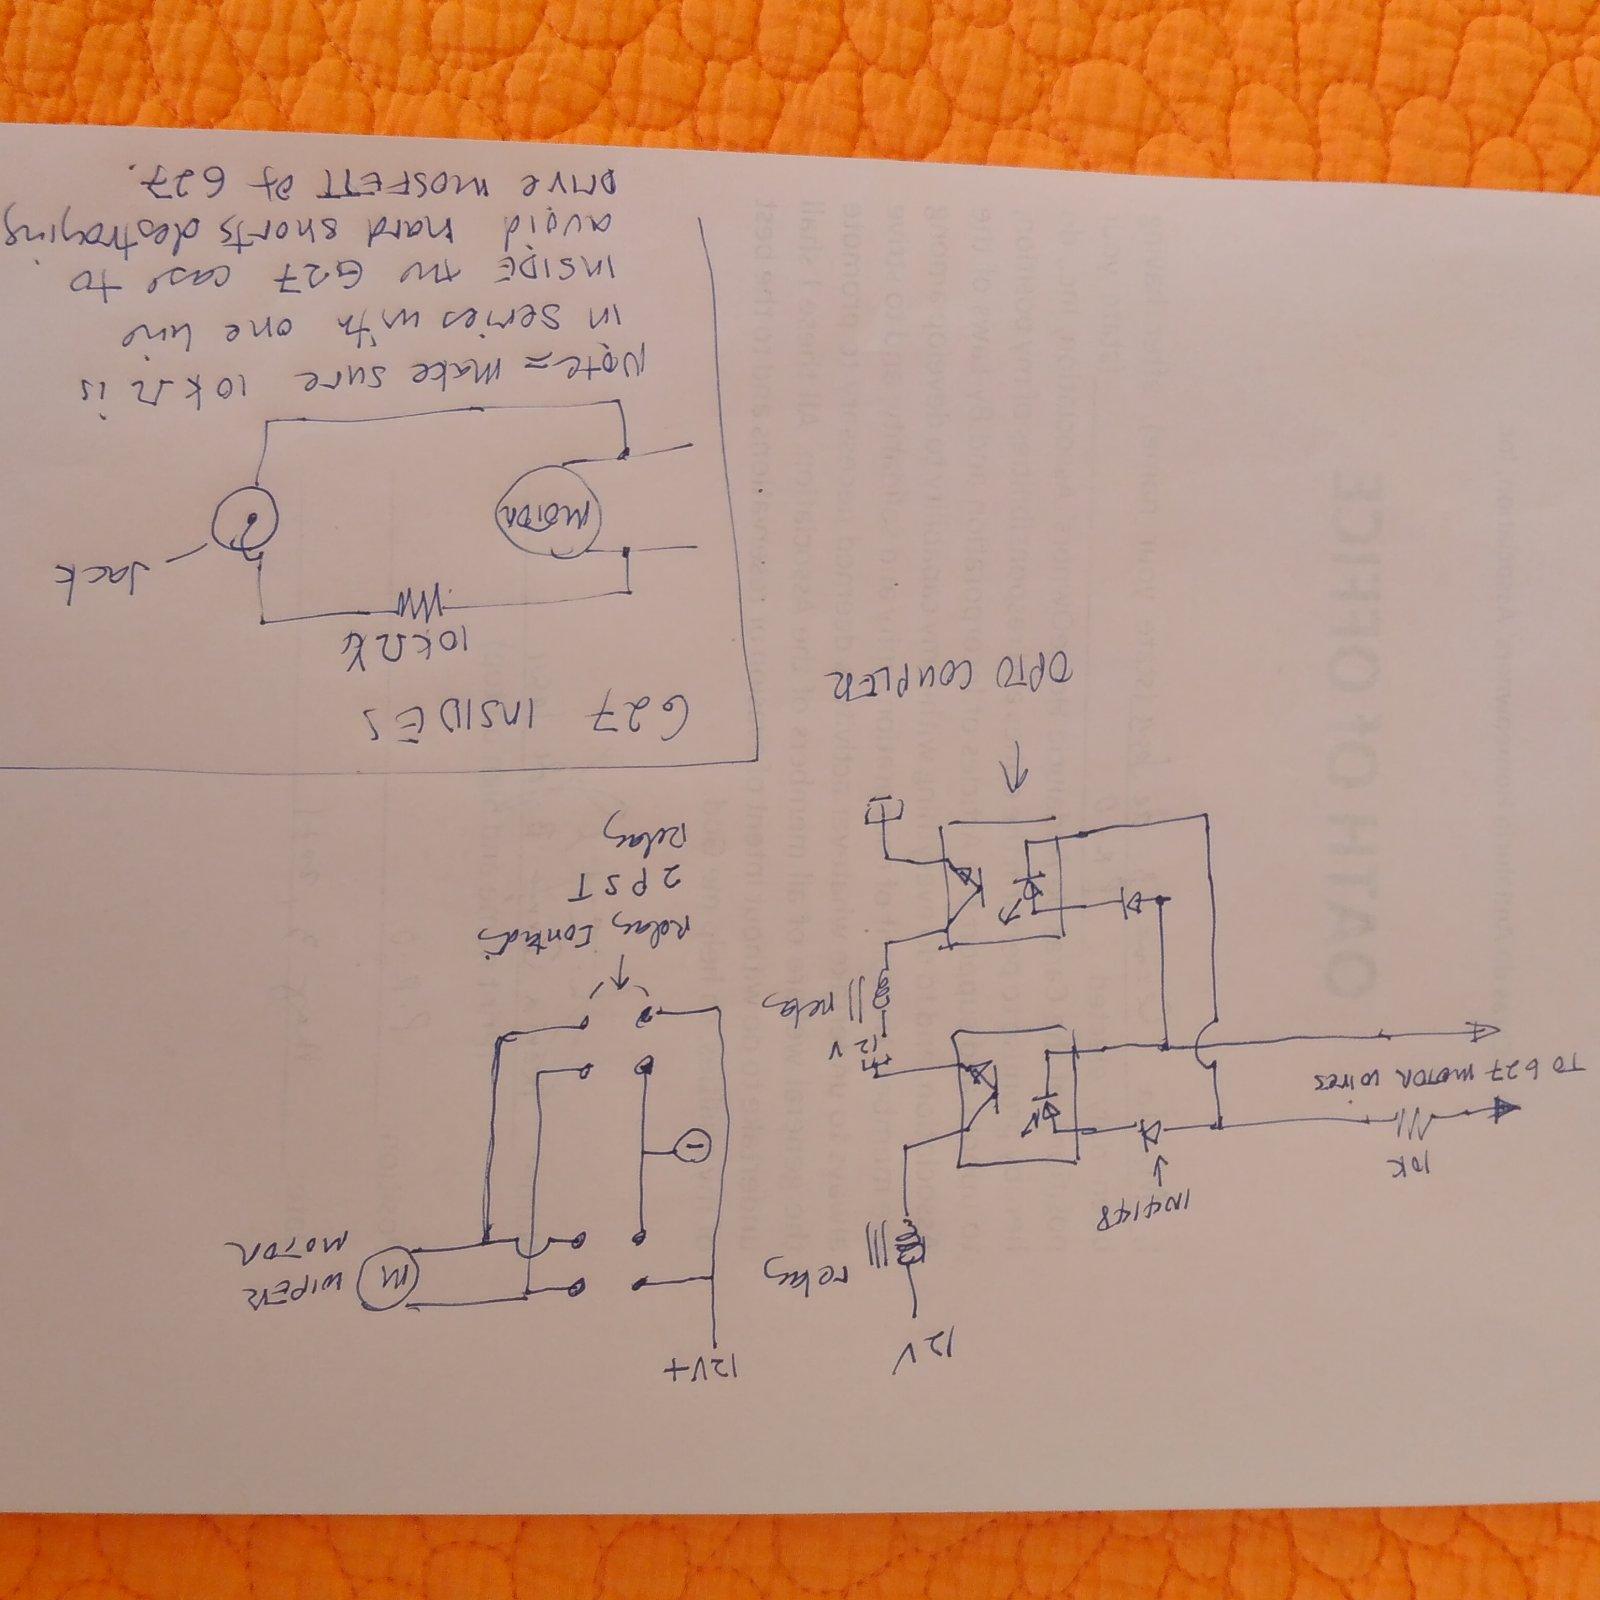 g27 to chair sway Circuit.jpg